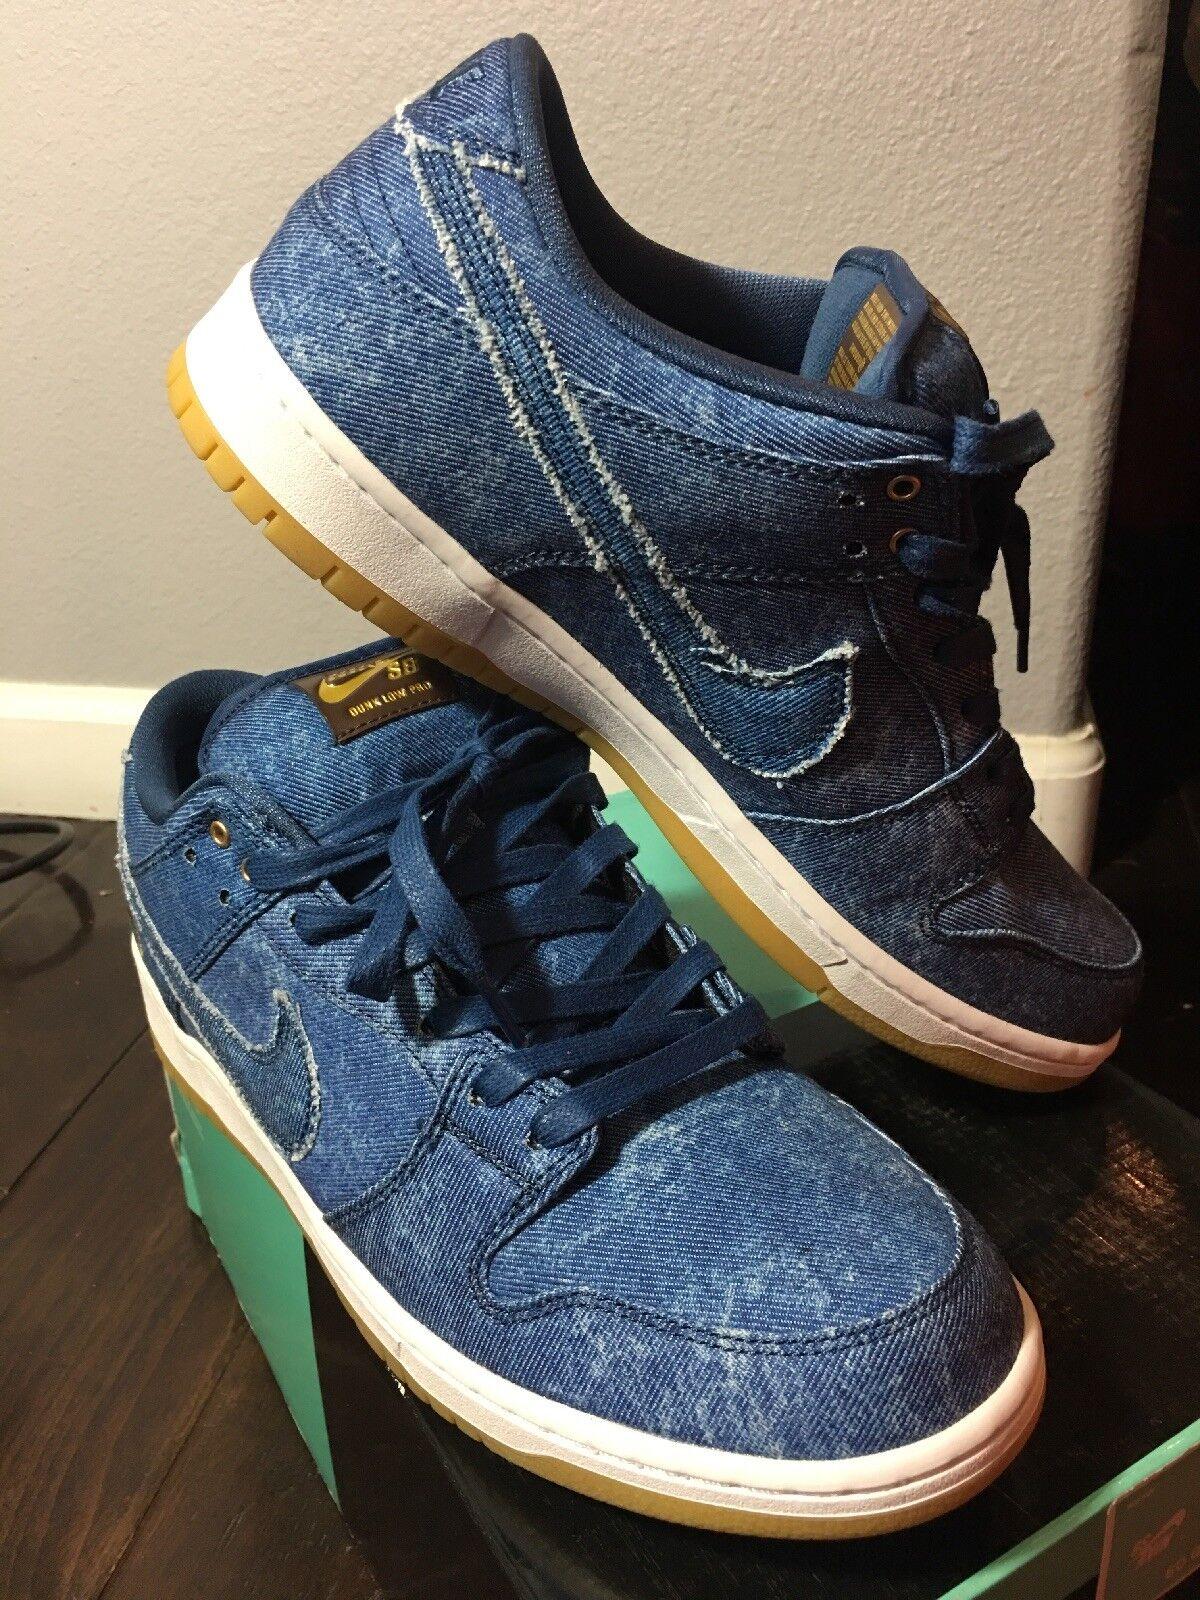 pretty nice fc282 d9ab5 Mens Nike SB Dunk Low TRD QS Utility Blue White Gum Brown 883232-441 US 12  for sale online | eBay